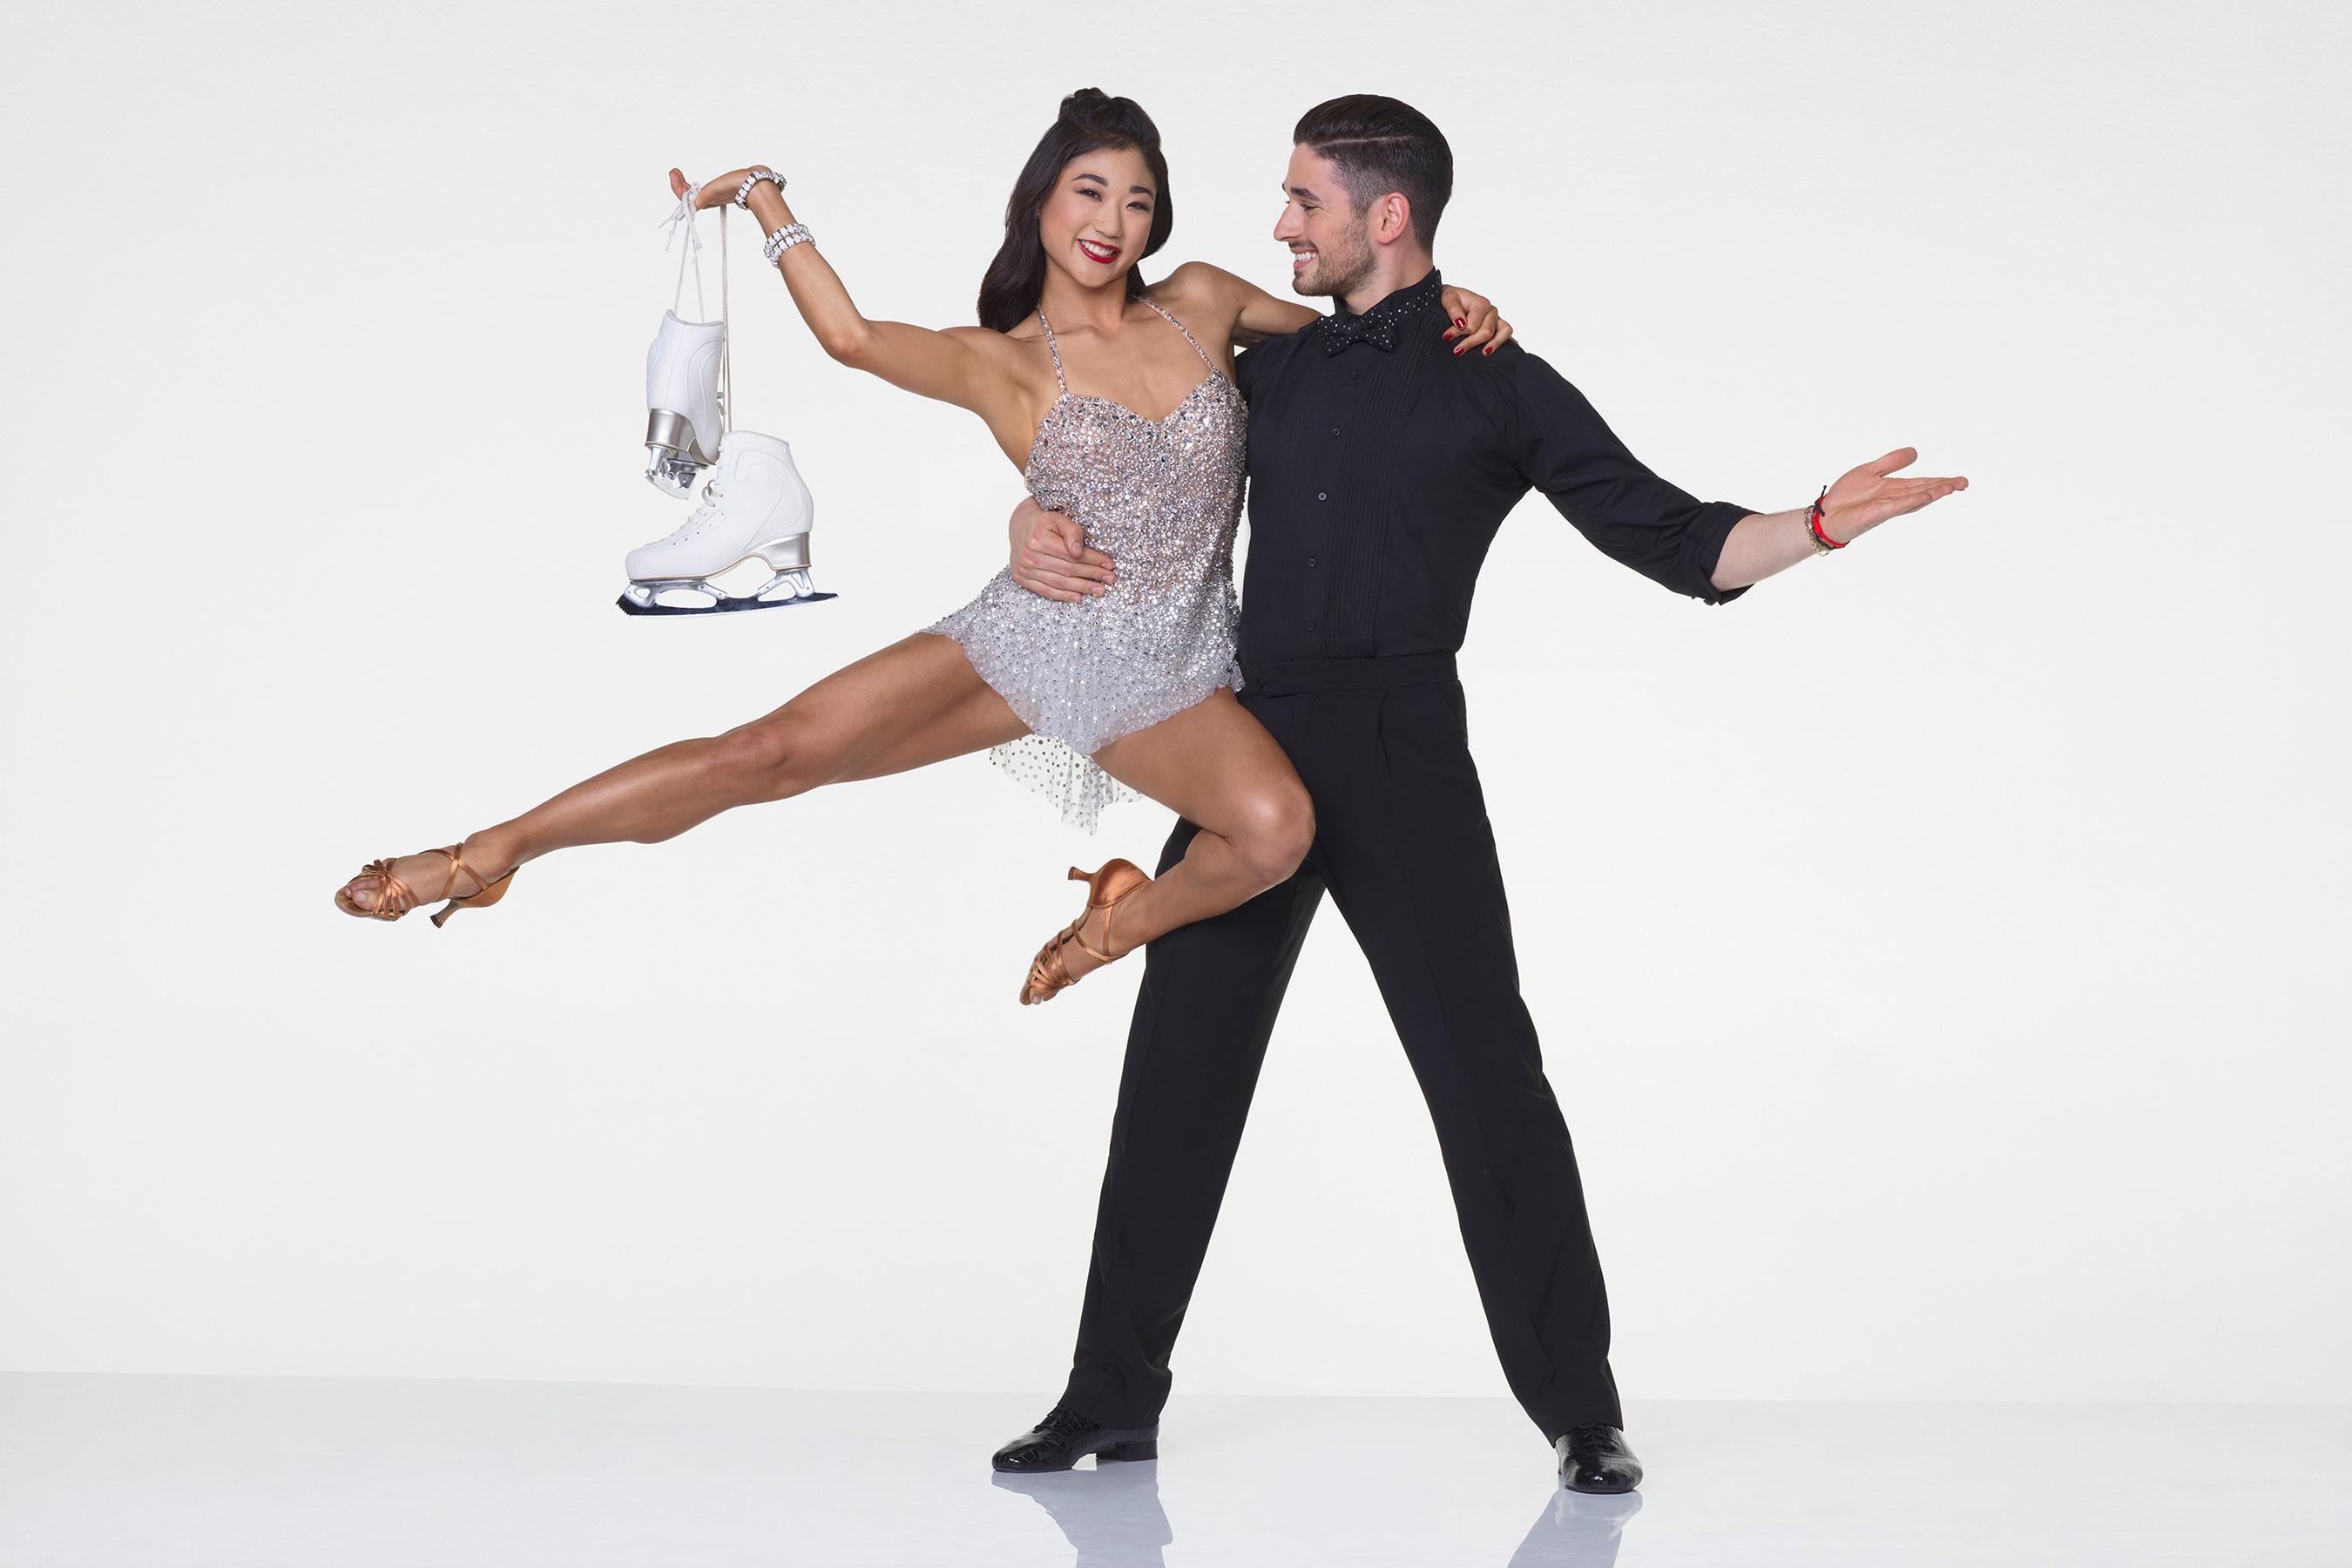 Dance partners photo